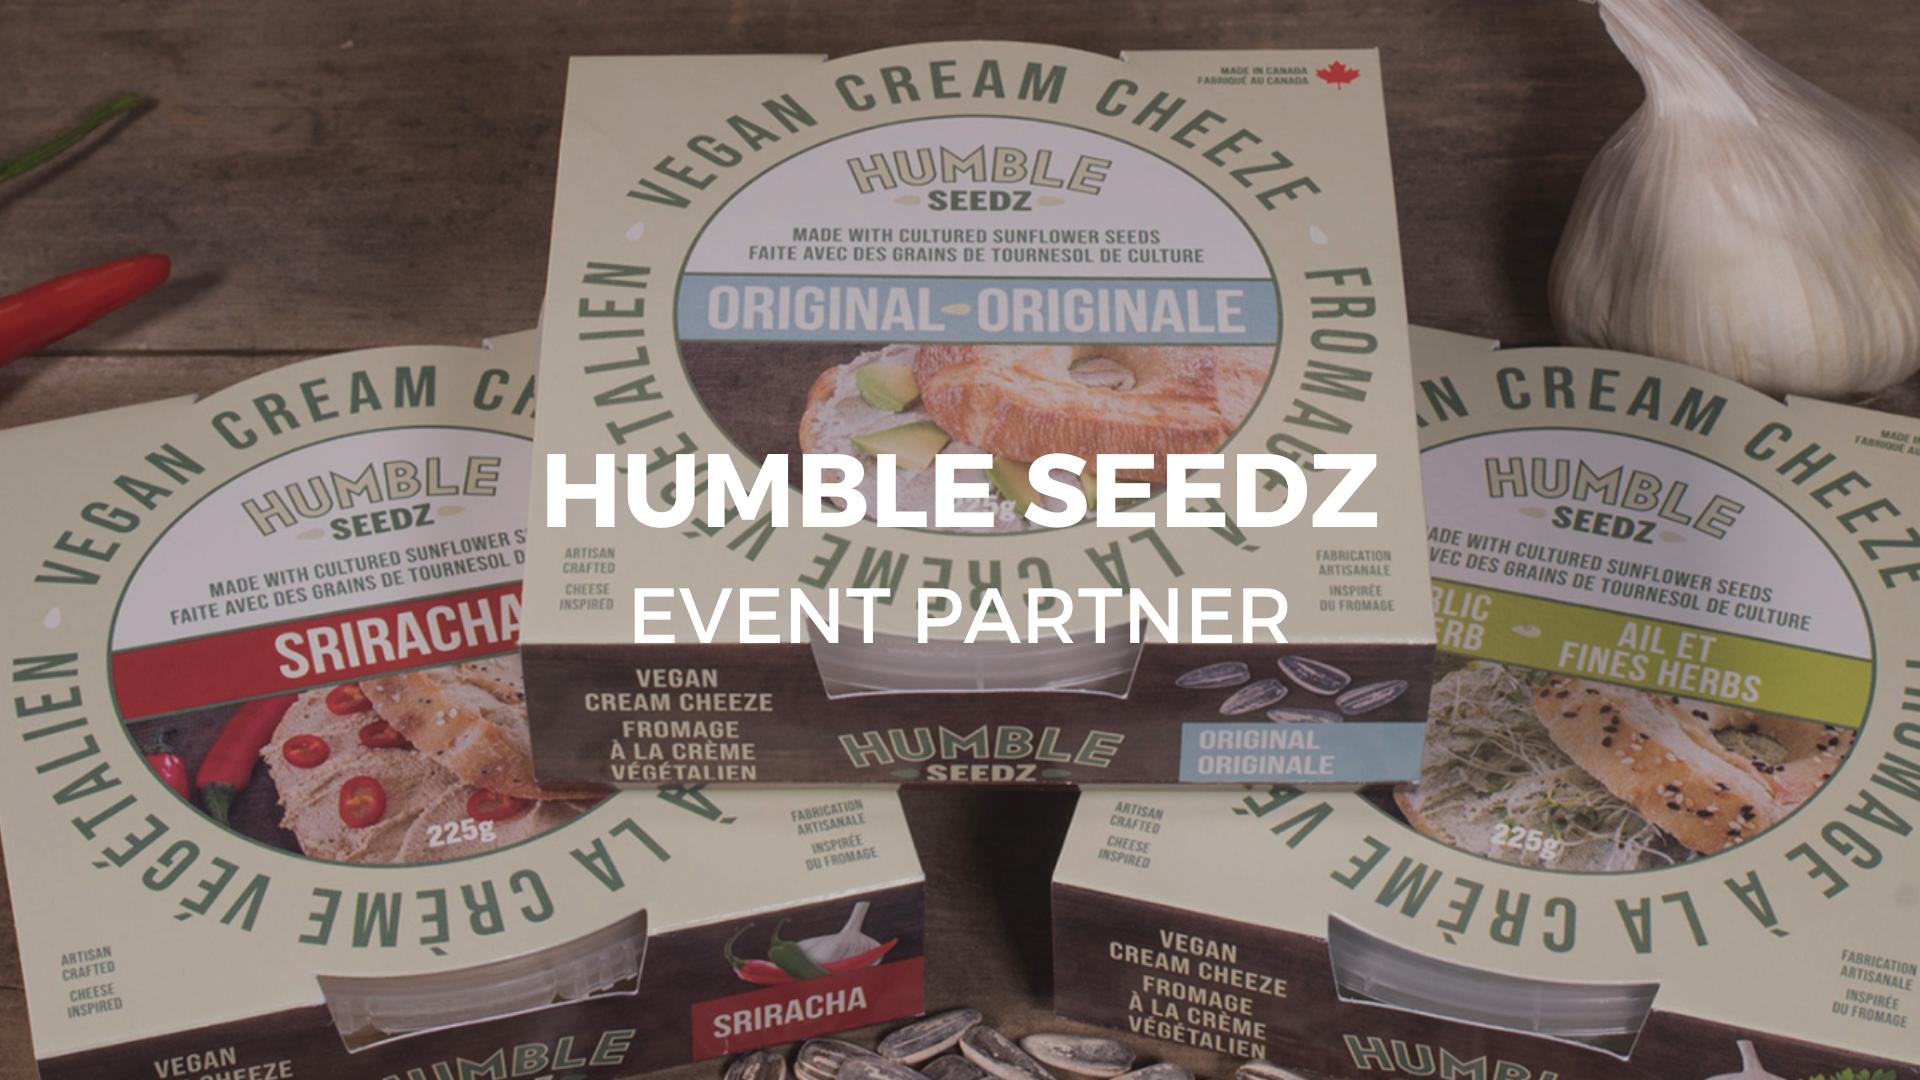 Vegan Cream Cheeze spread, made with cultured sunflower seeds in Orangeville Ontario. Gluten Free, Soy Free, GMO Free.